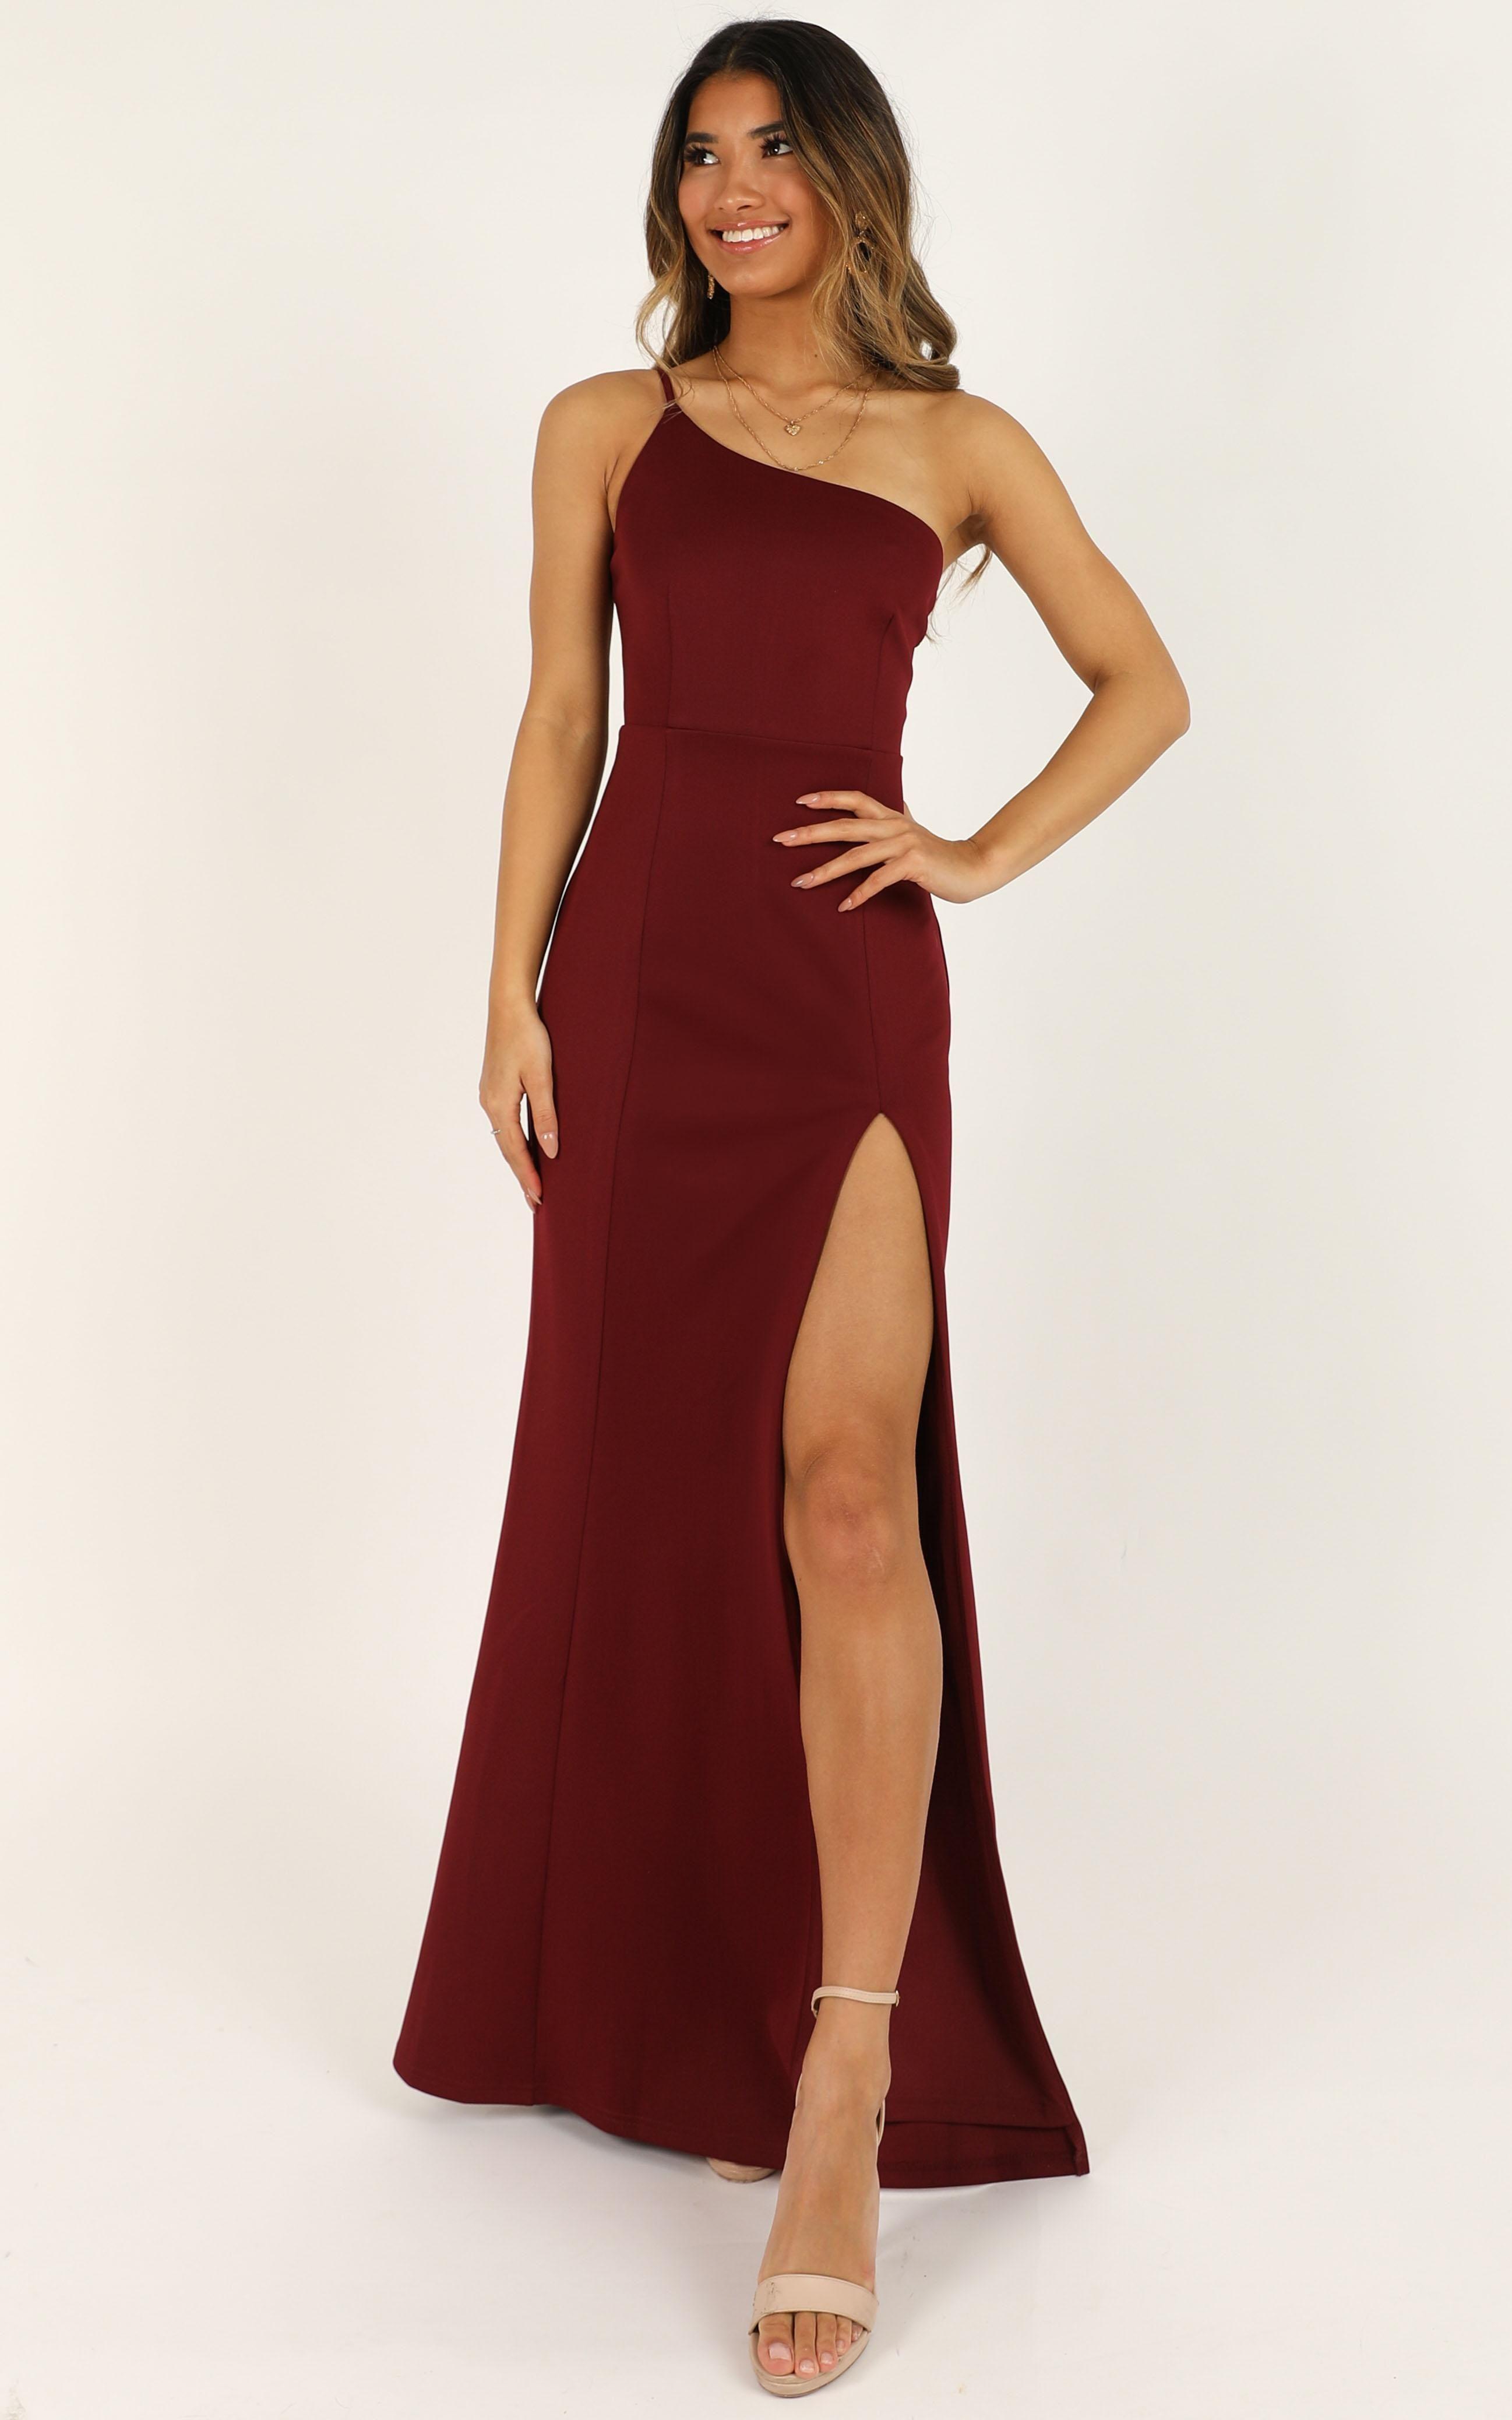 No Ones Fault Dress In Wine Showpo Strapless Dress Formal Homecoming Dresses Dresses [ 4152 x 2595 Pixel ]